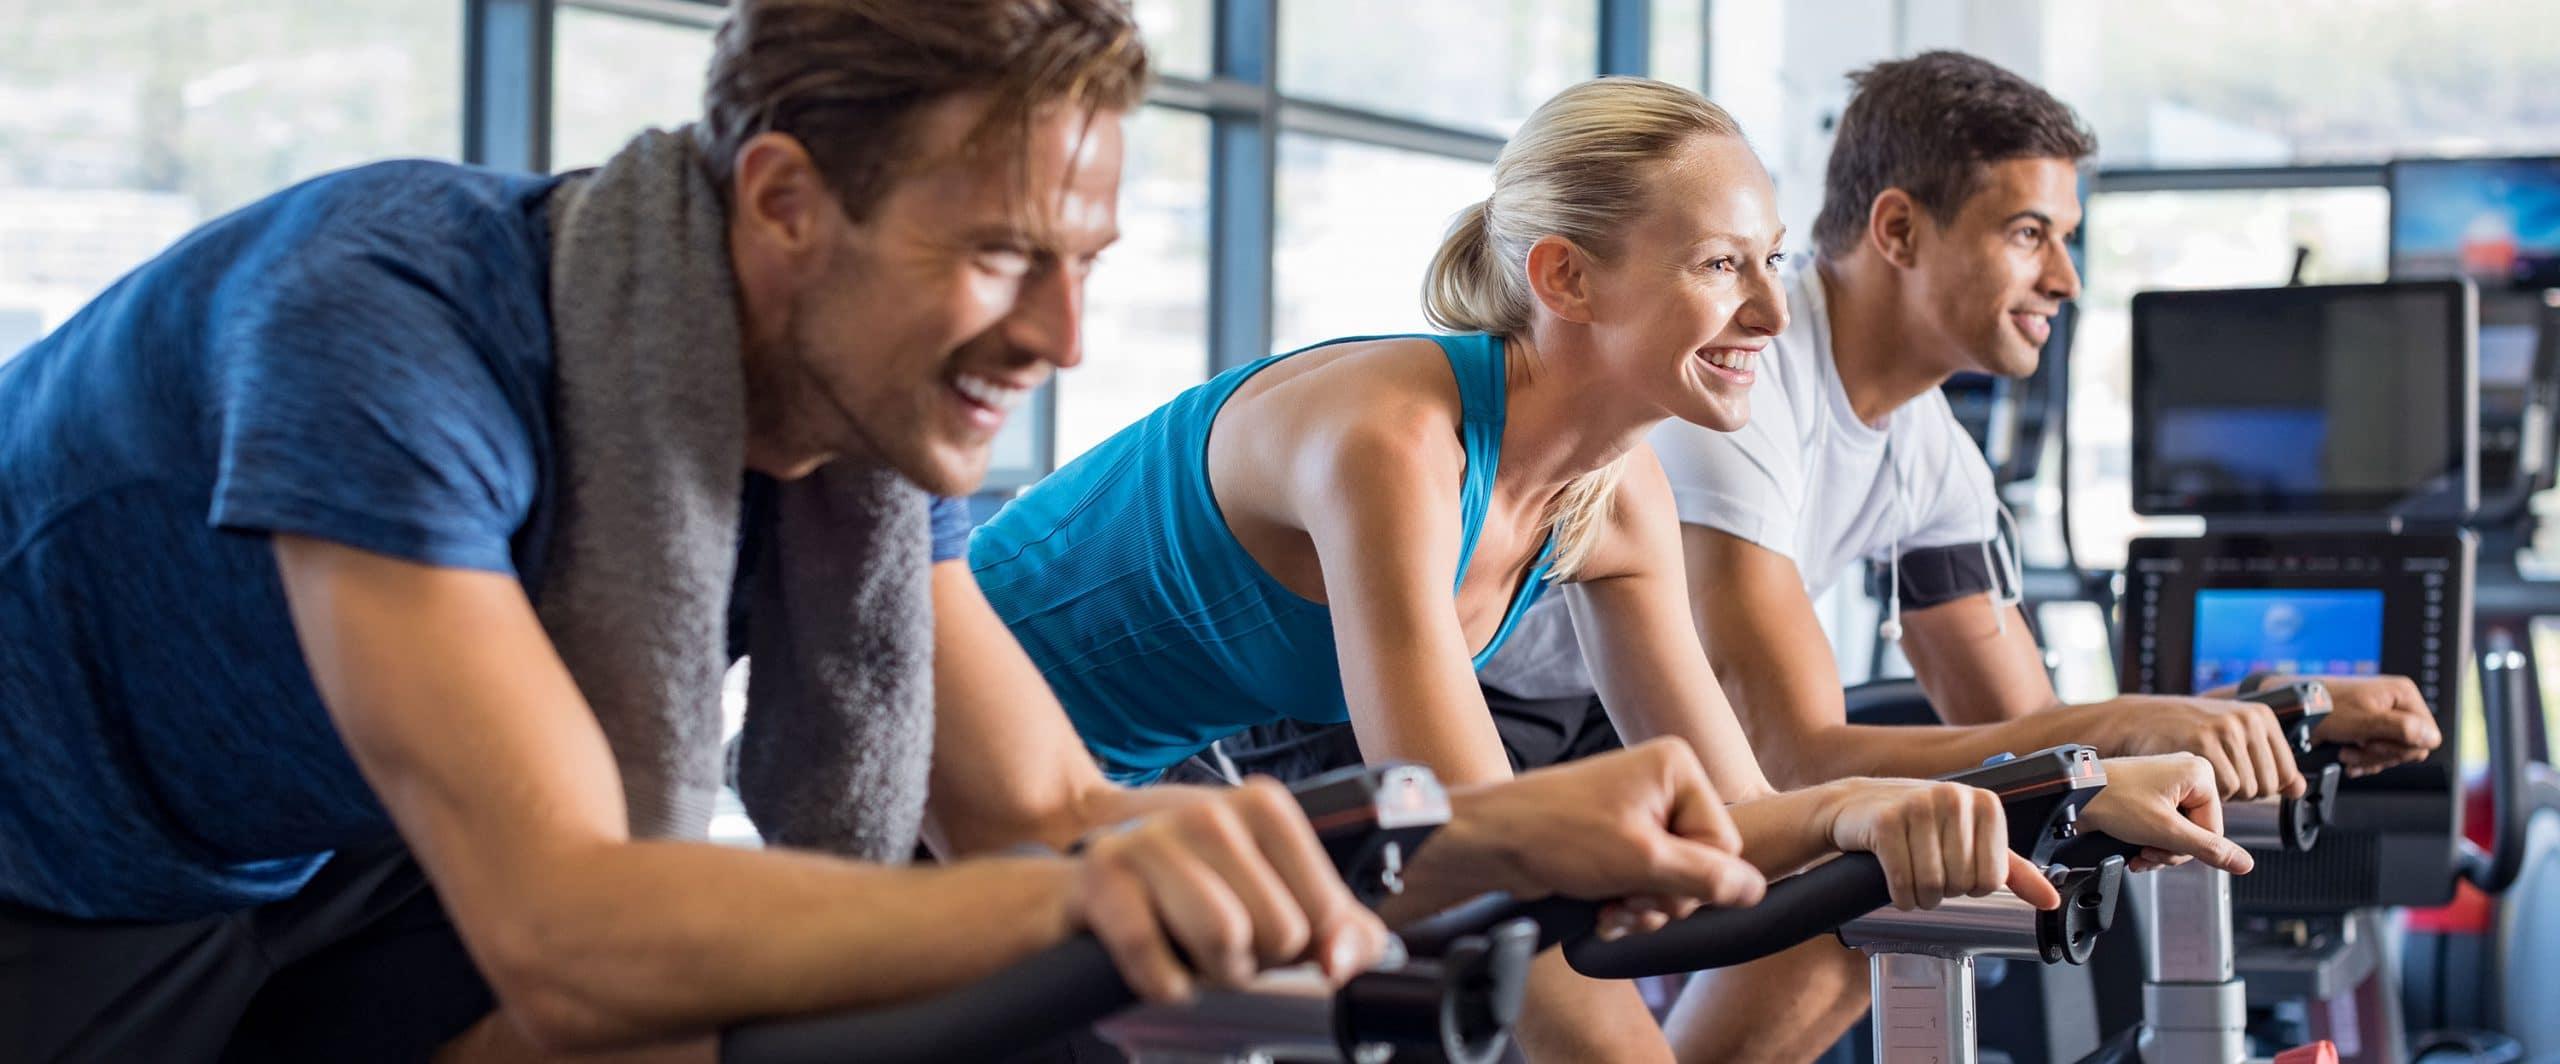 Angebot Fitnessstudio 7 Monate gratis